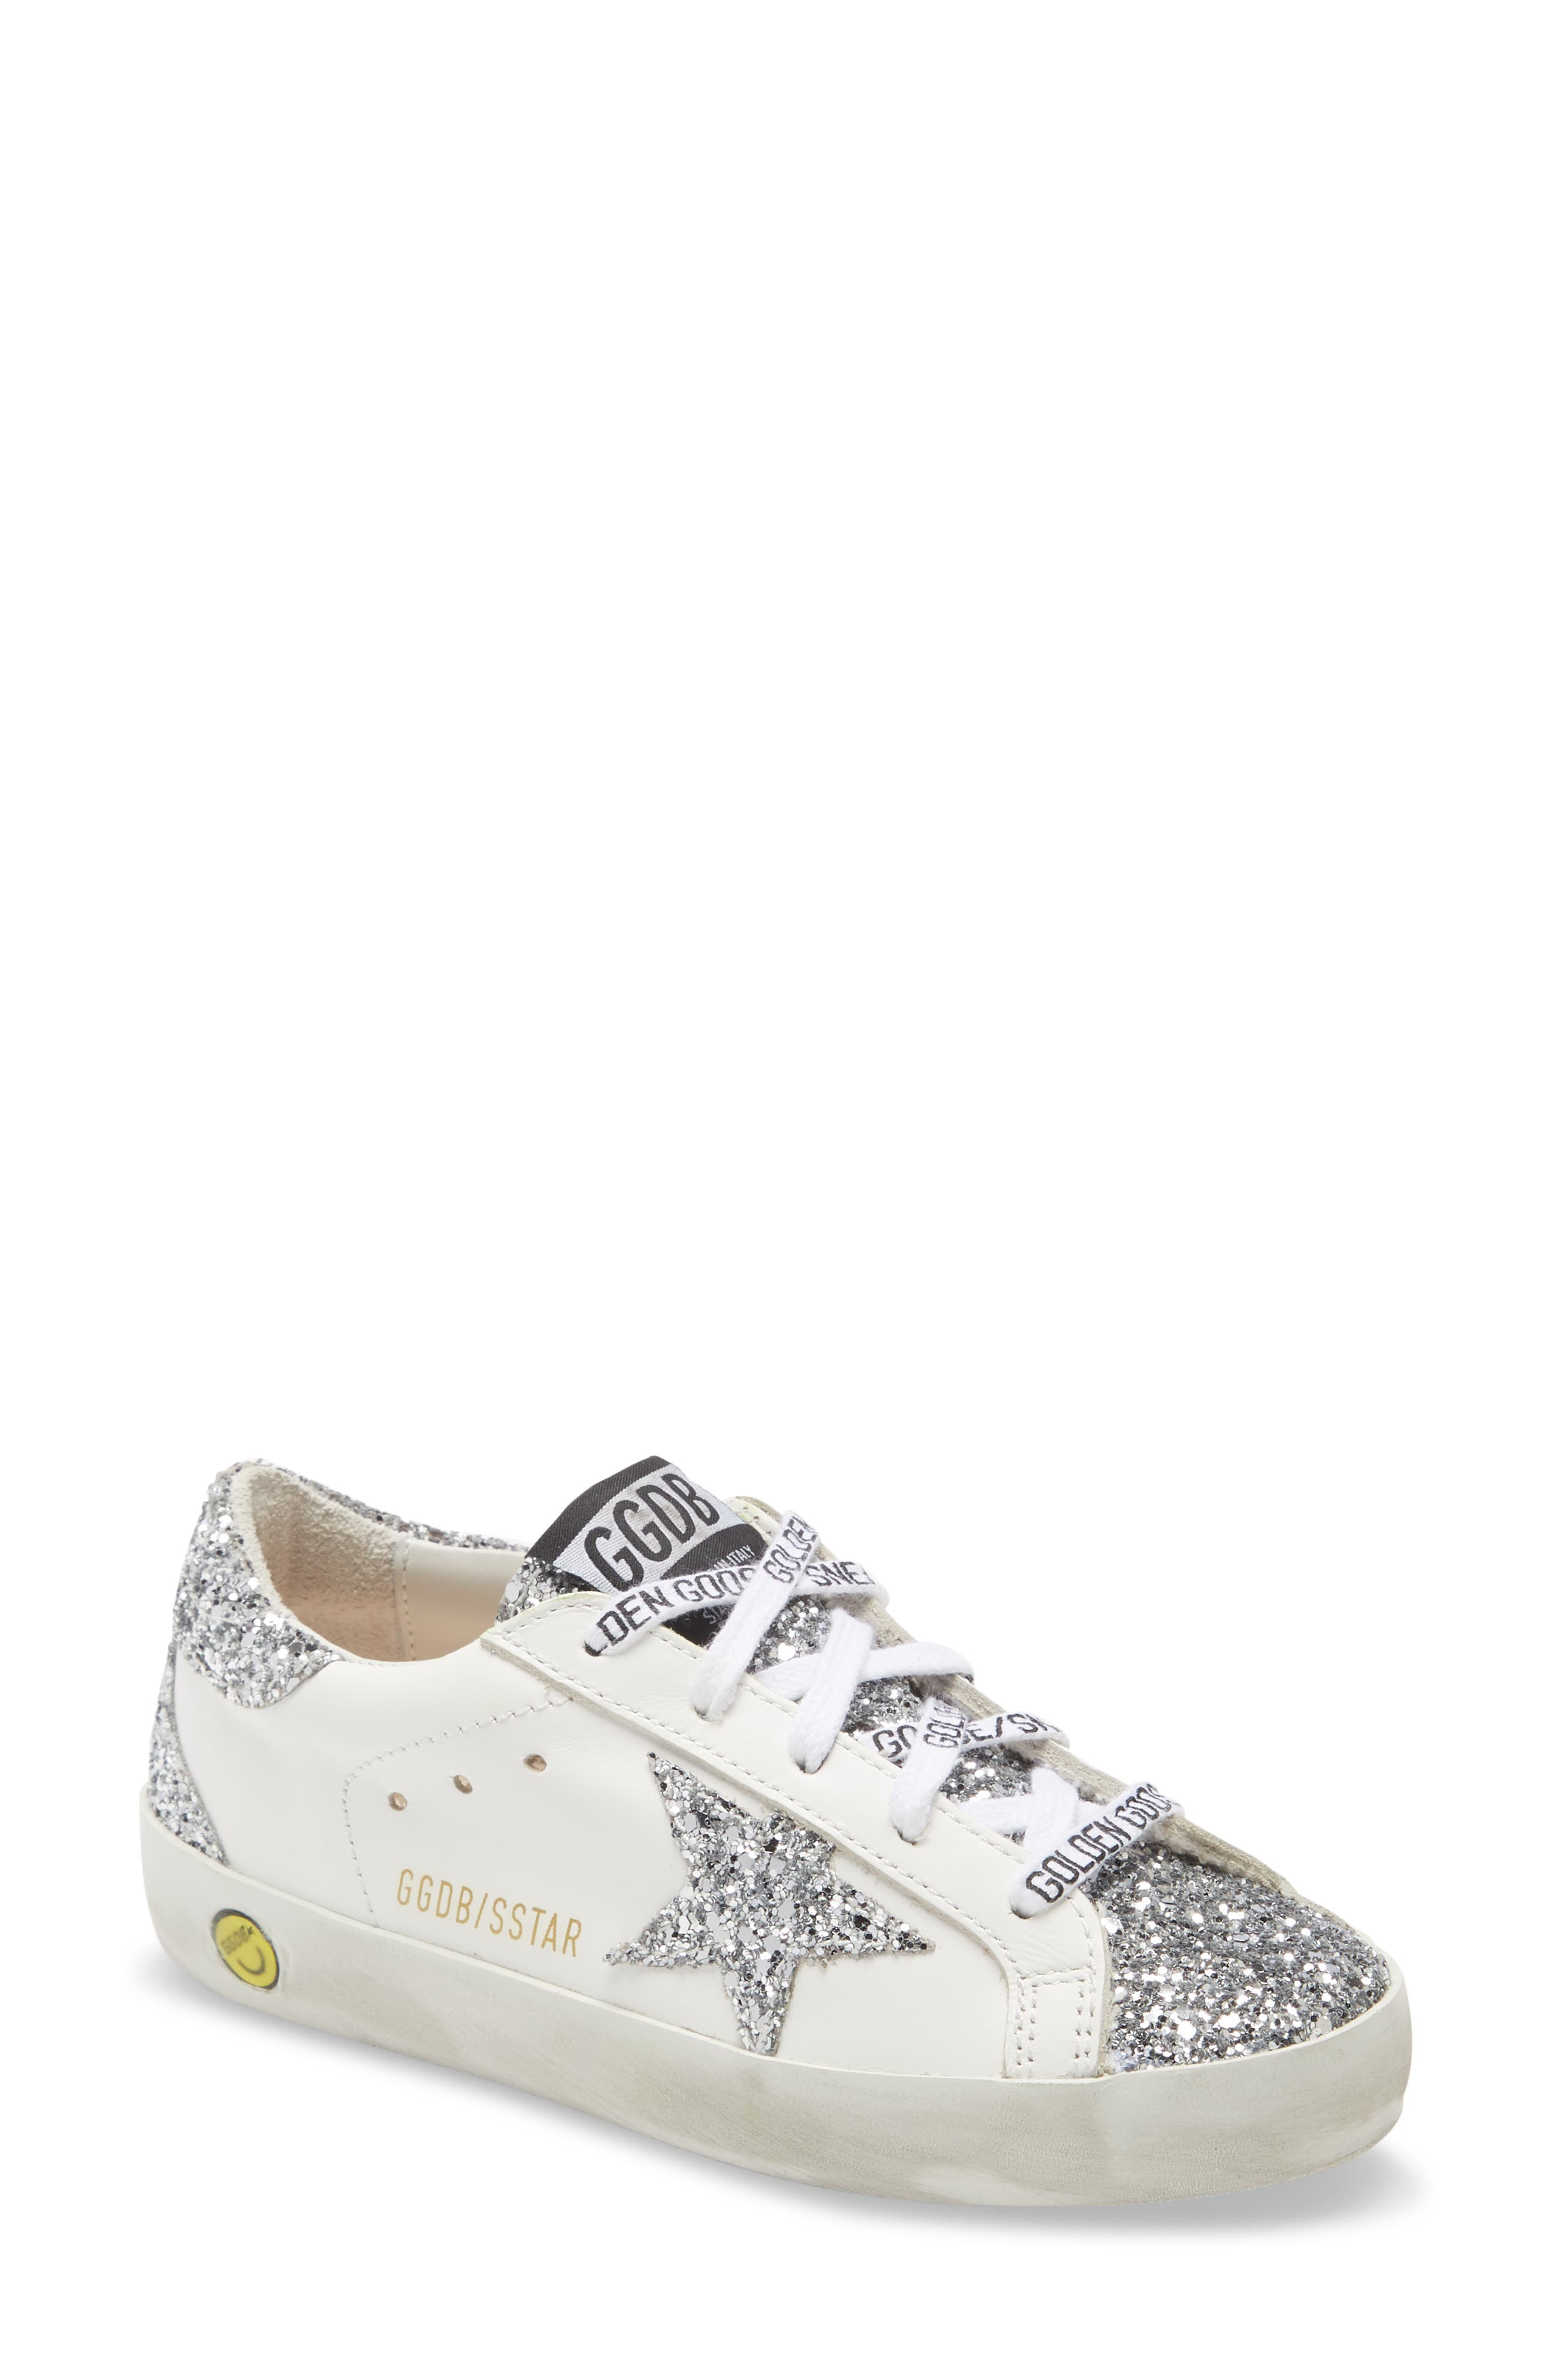 Girls' Golden Goose Shoes